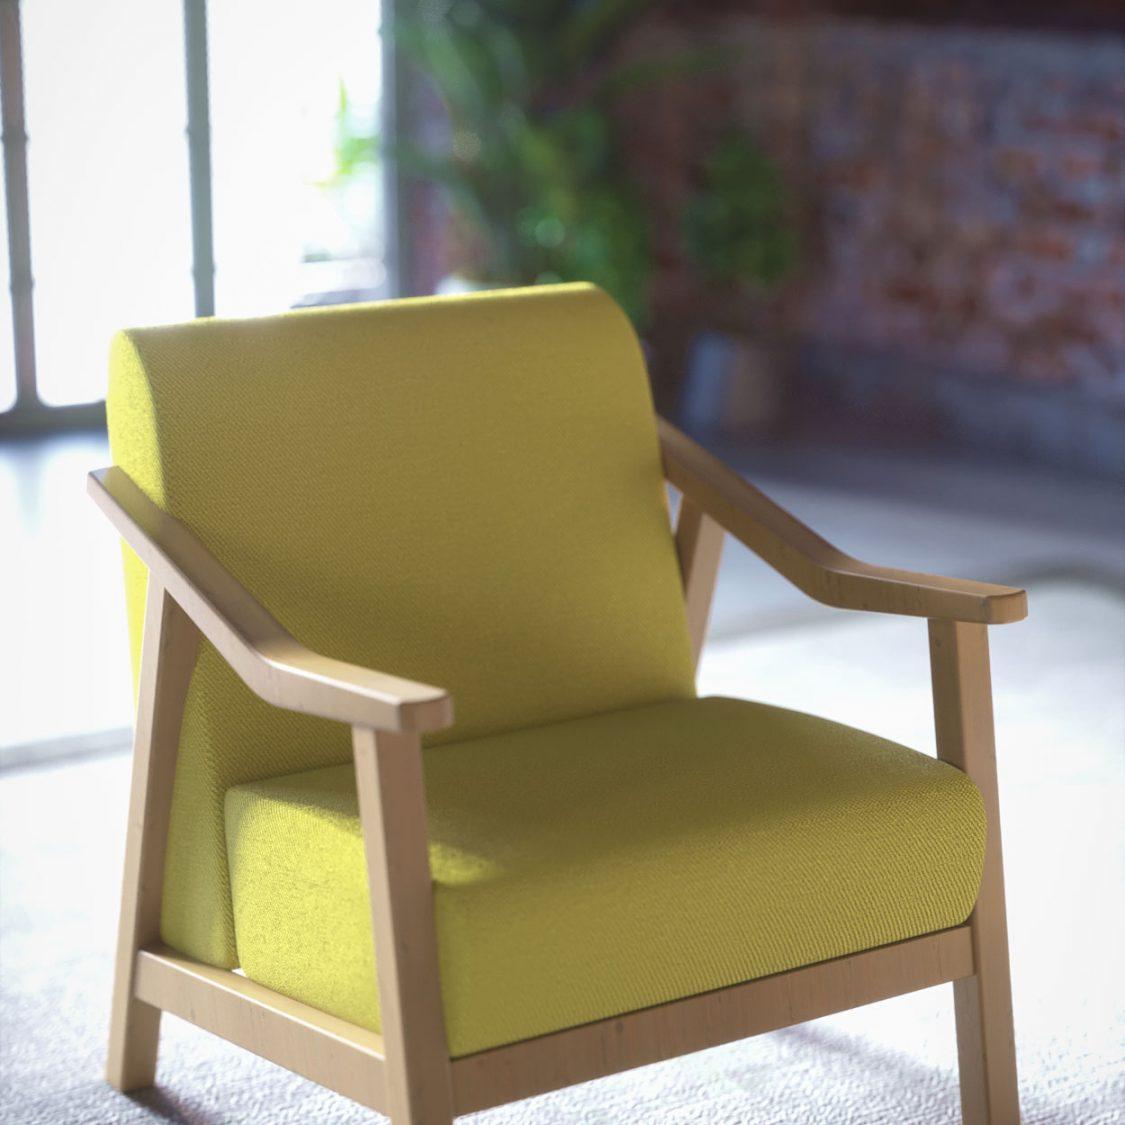 prodect renders, sofa rendering